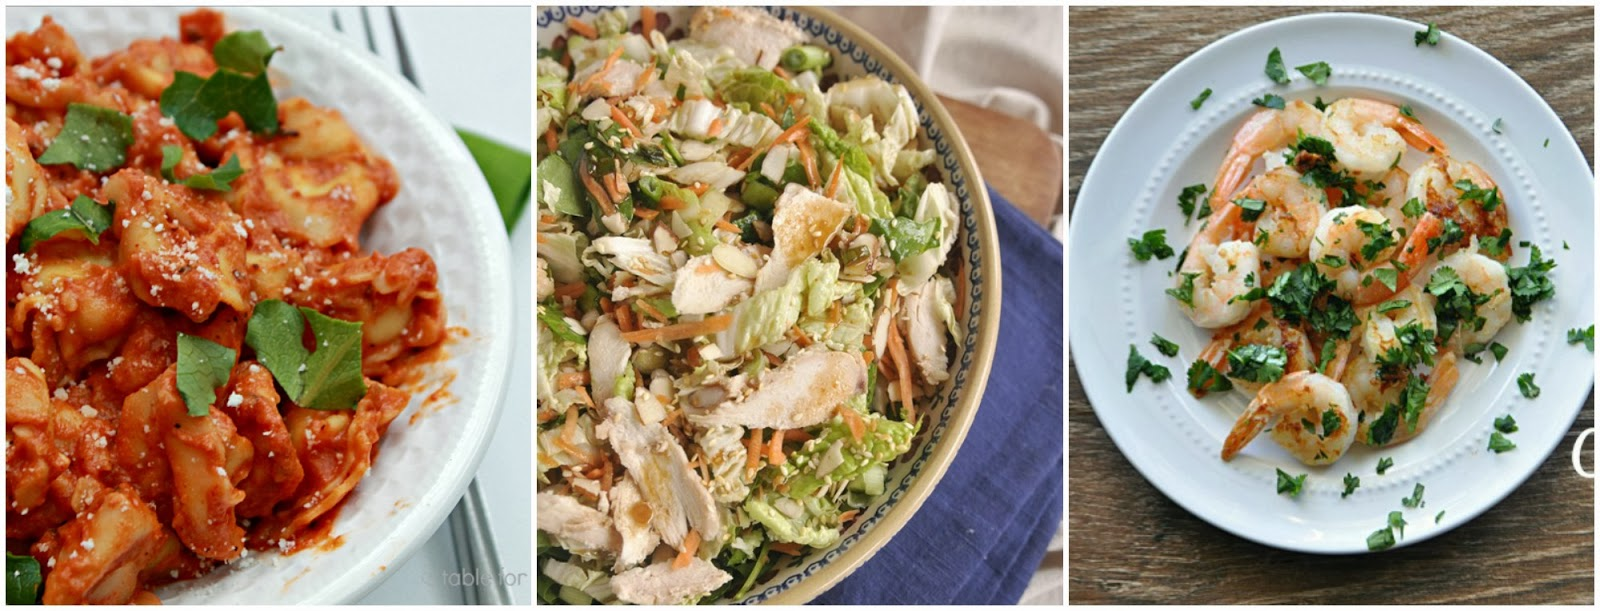 2 15 Easy Weeknight Meals 18